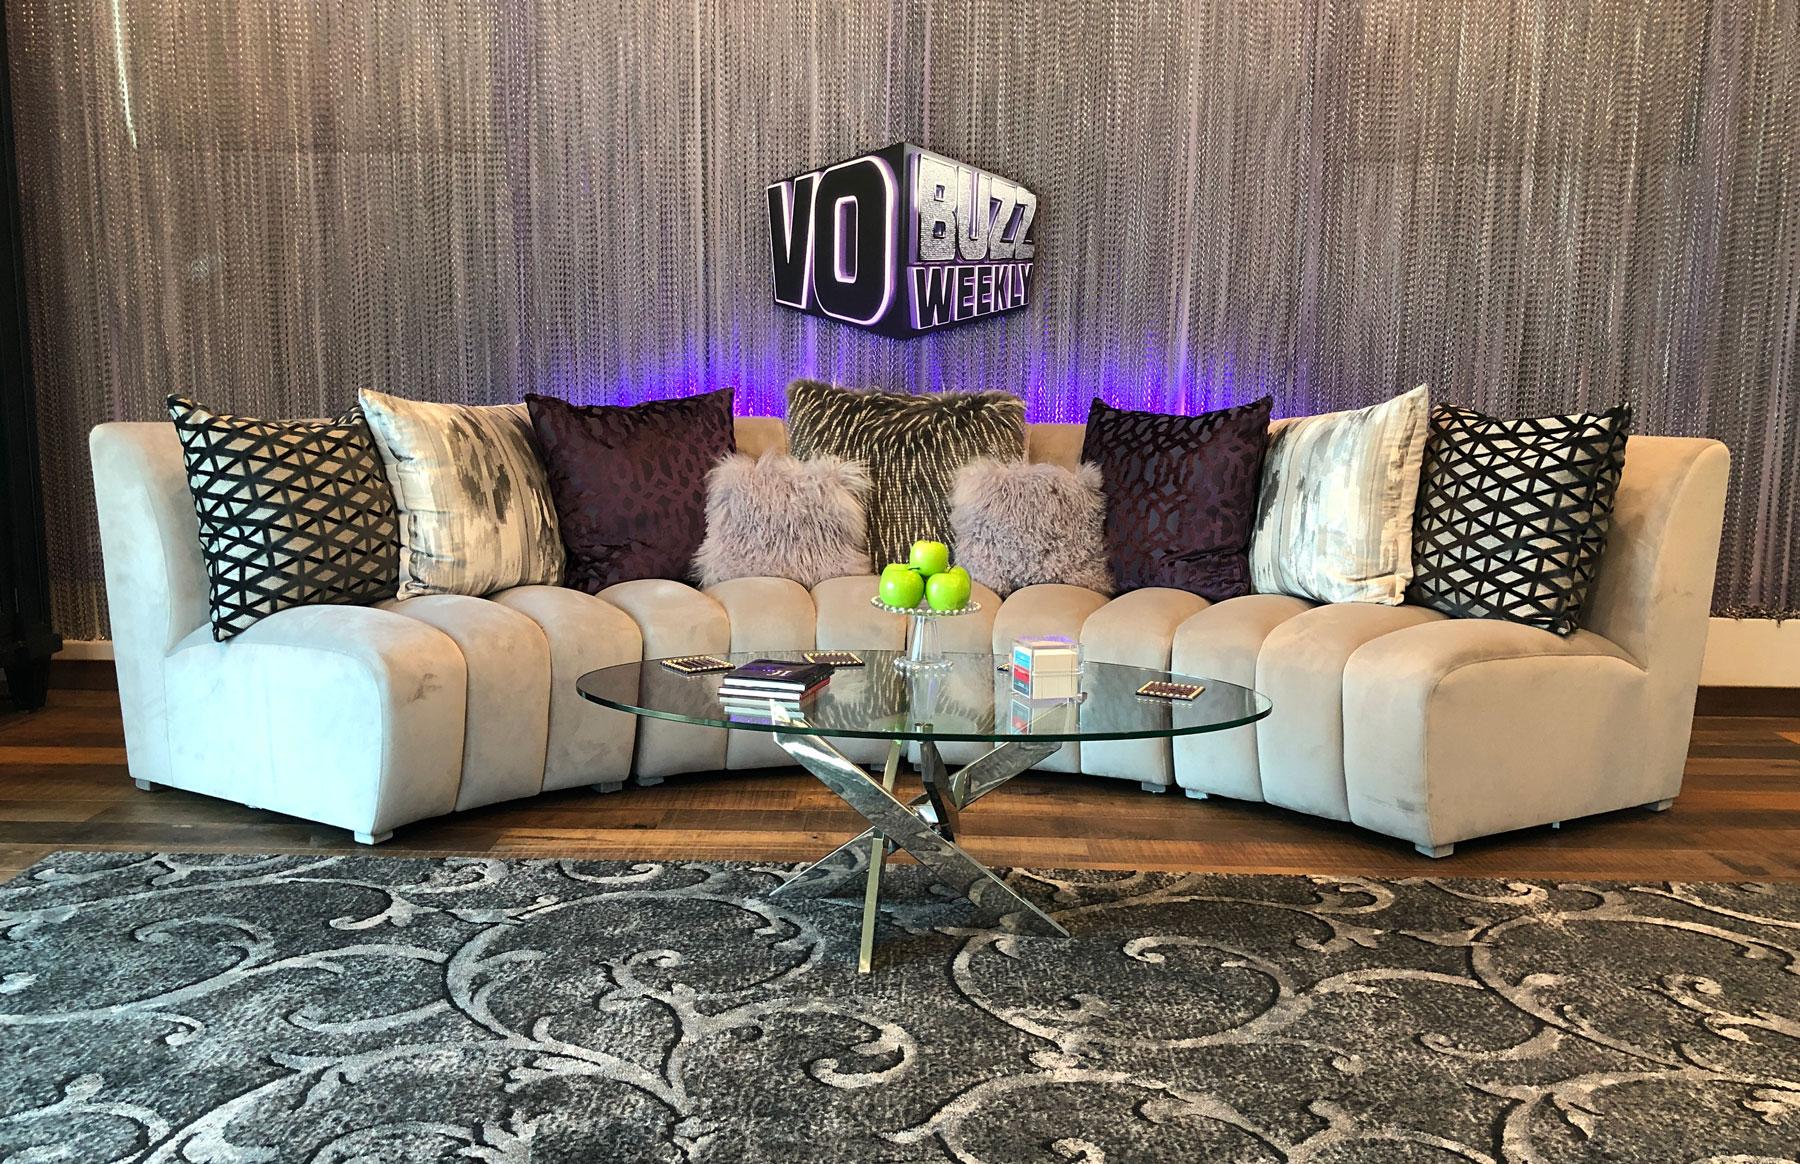 VO Buzz Weekly Set